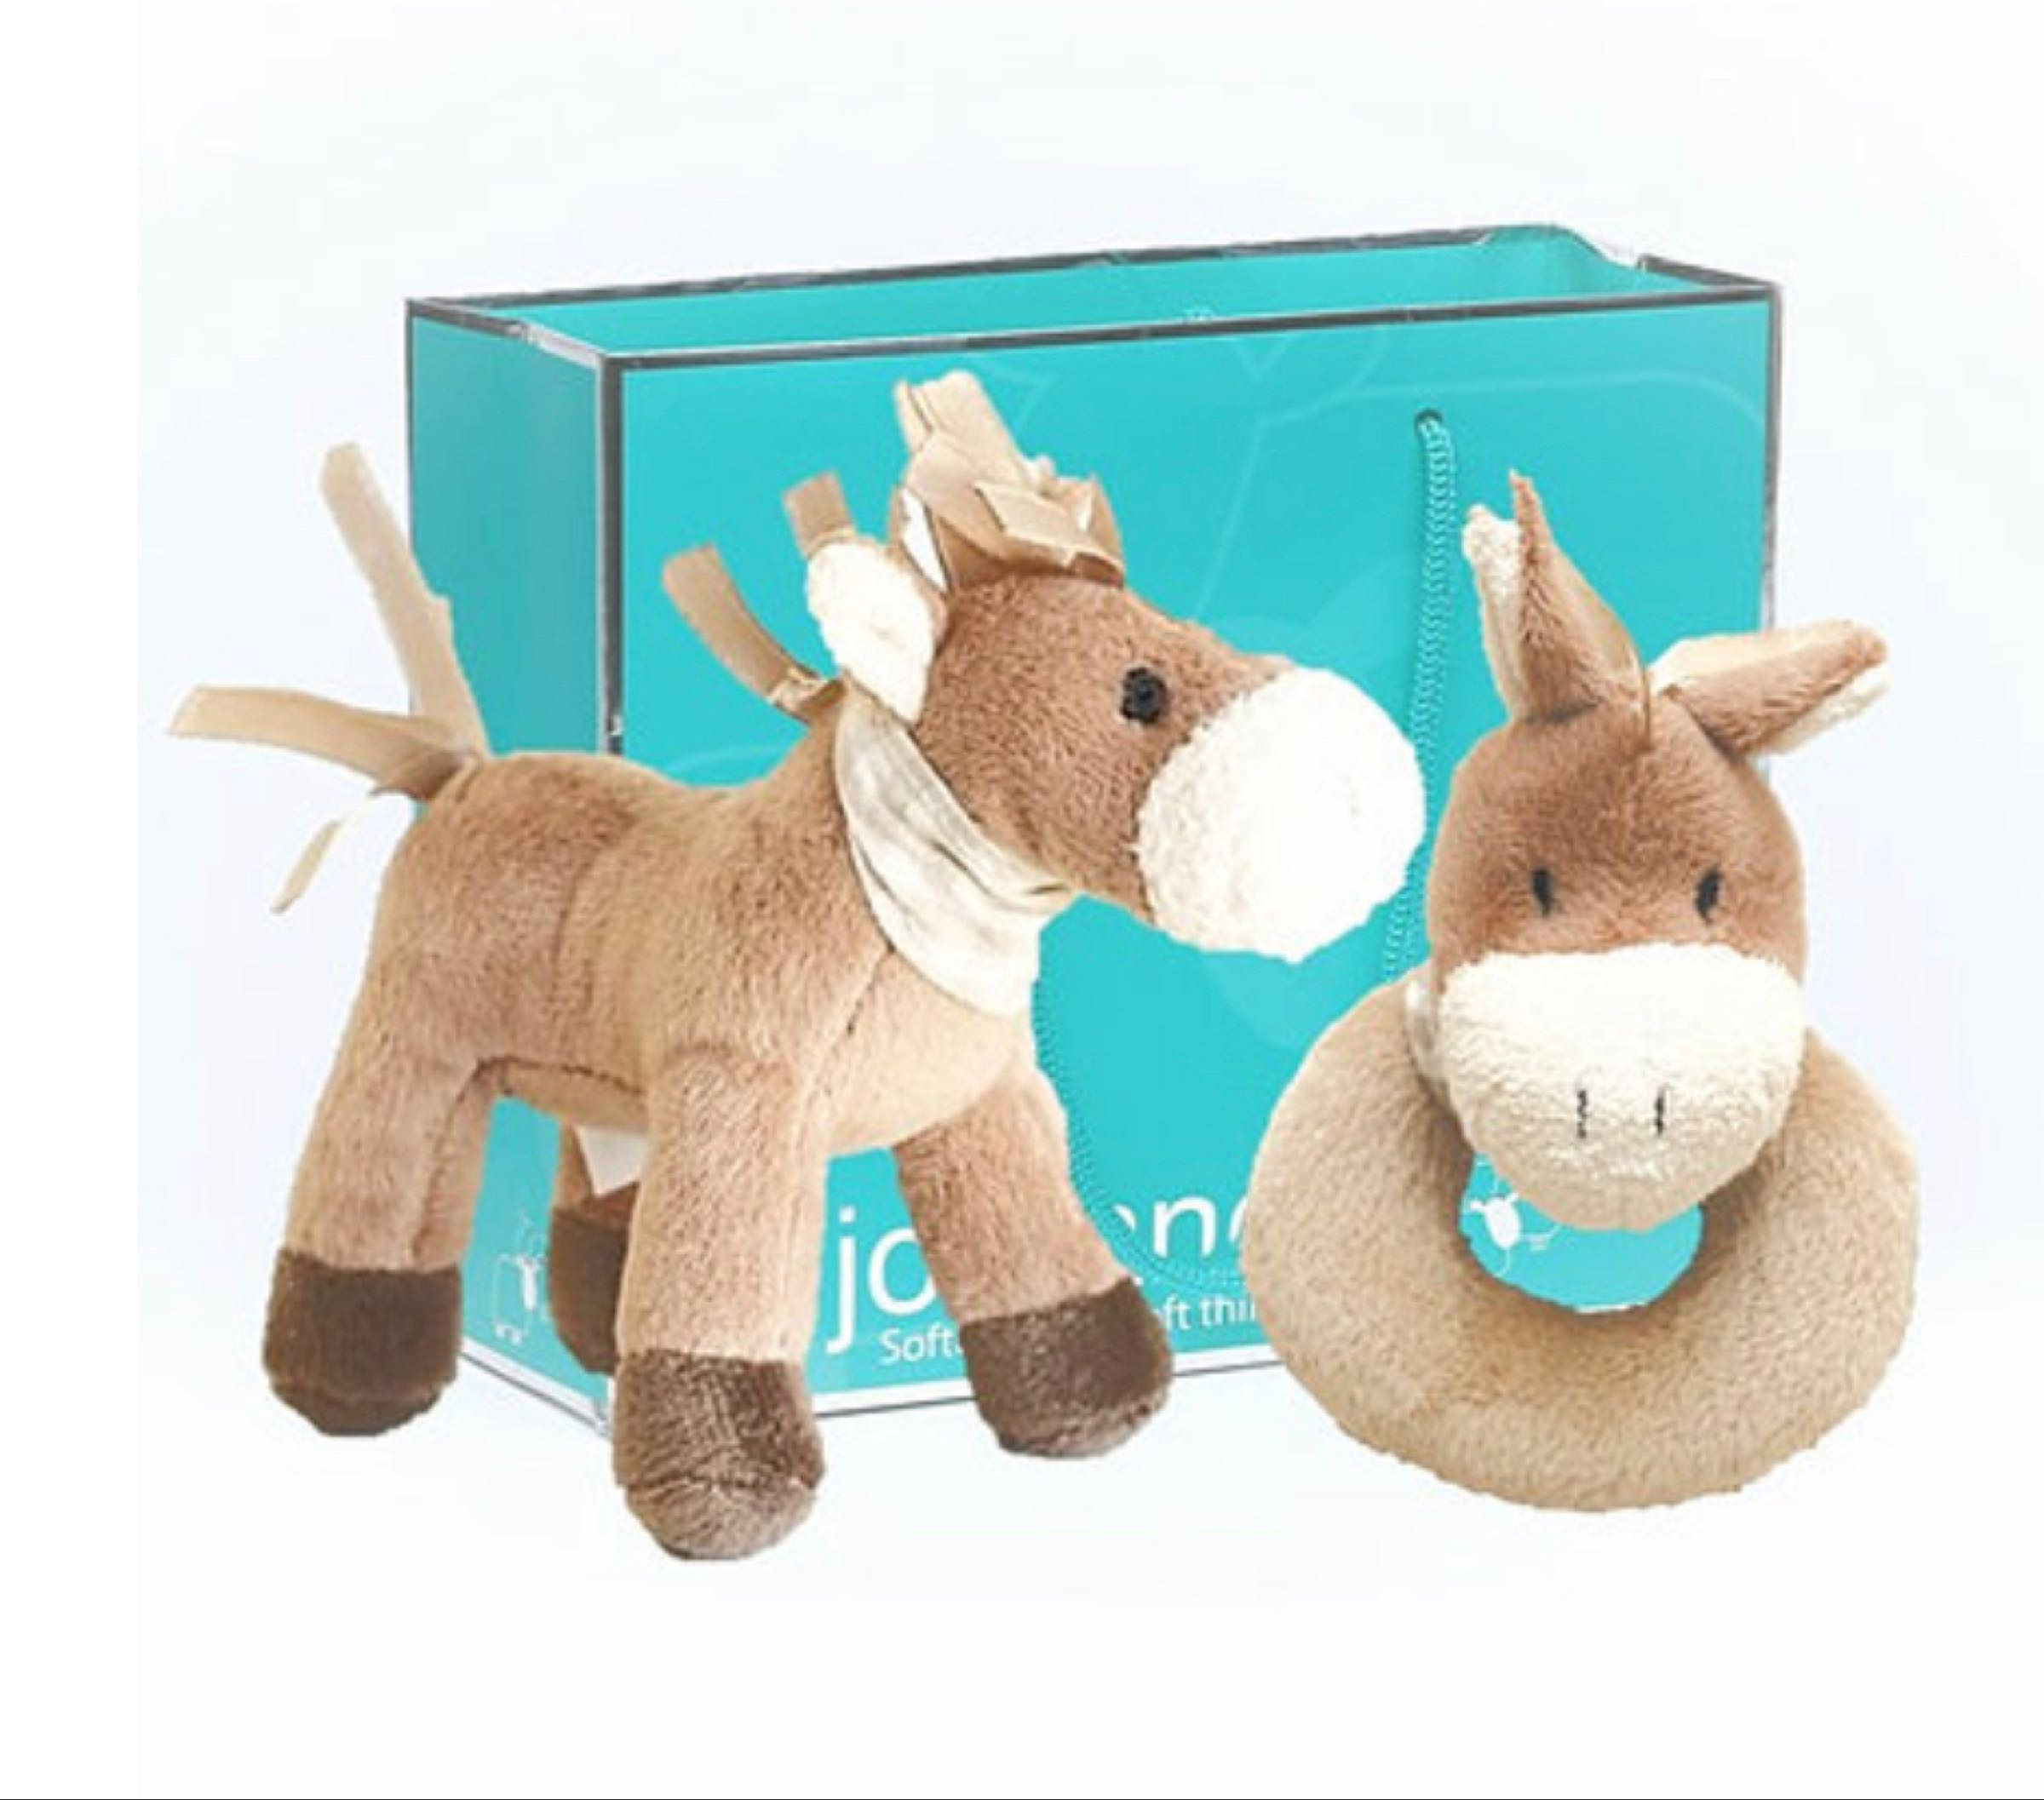 SPECIAL OFFER mini pony 10cm & pony baby rattle 10cm in a Jomanda gift bag